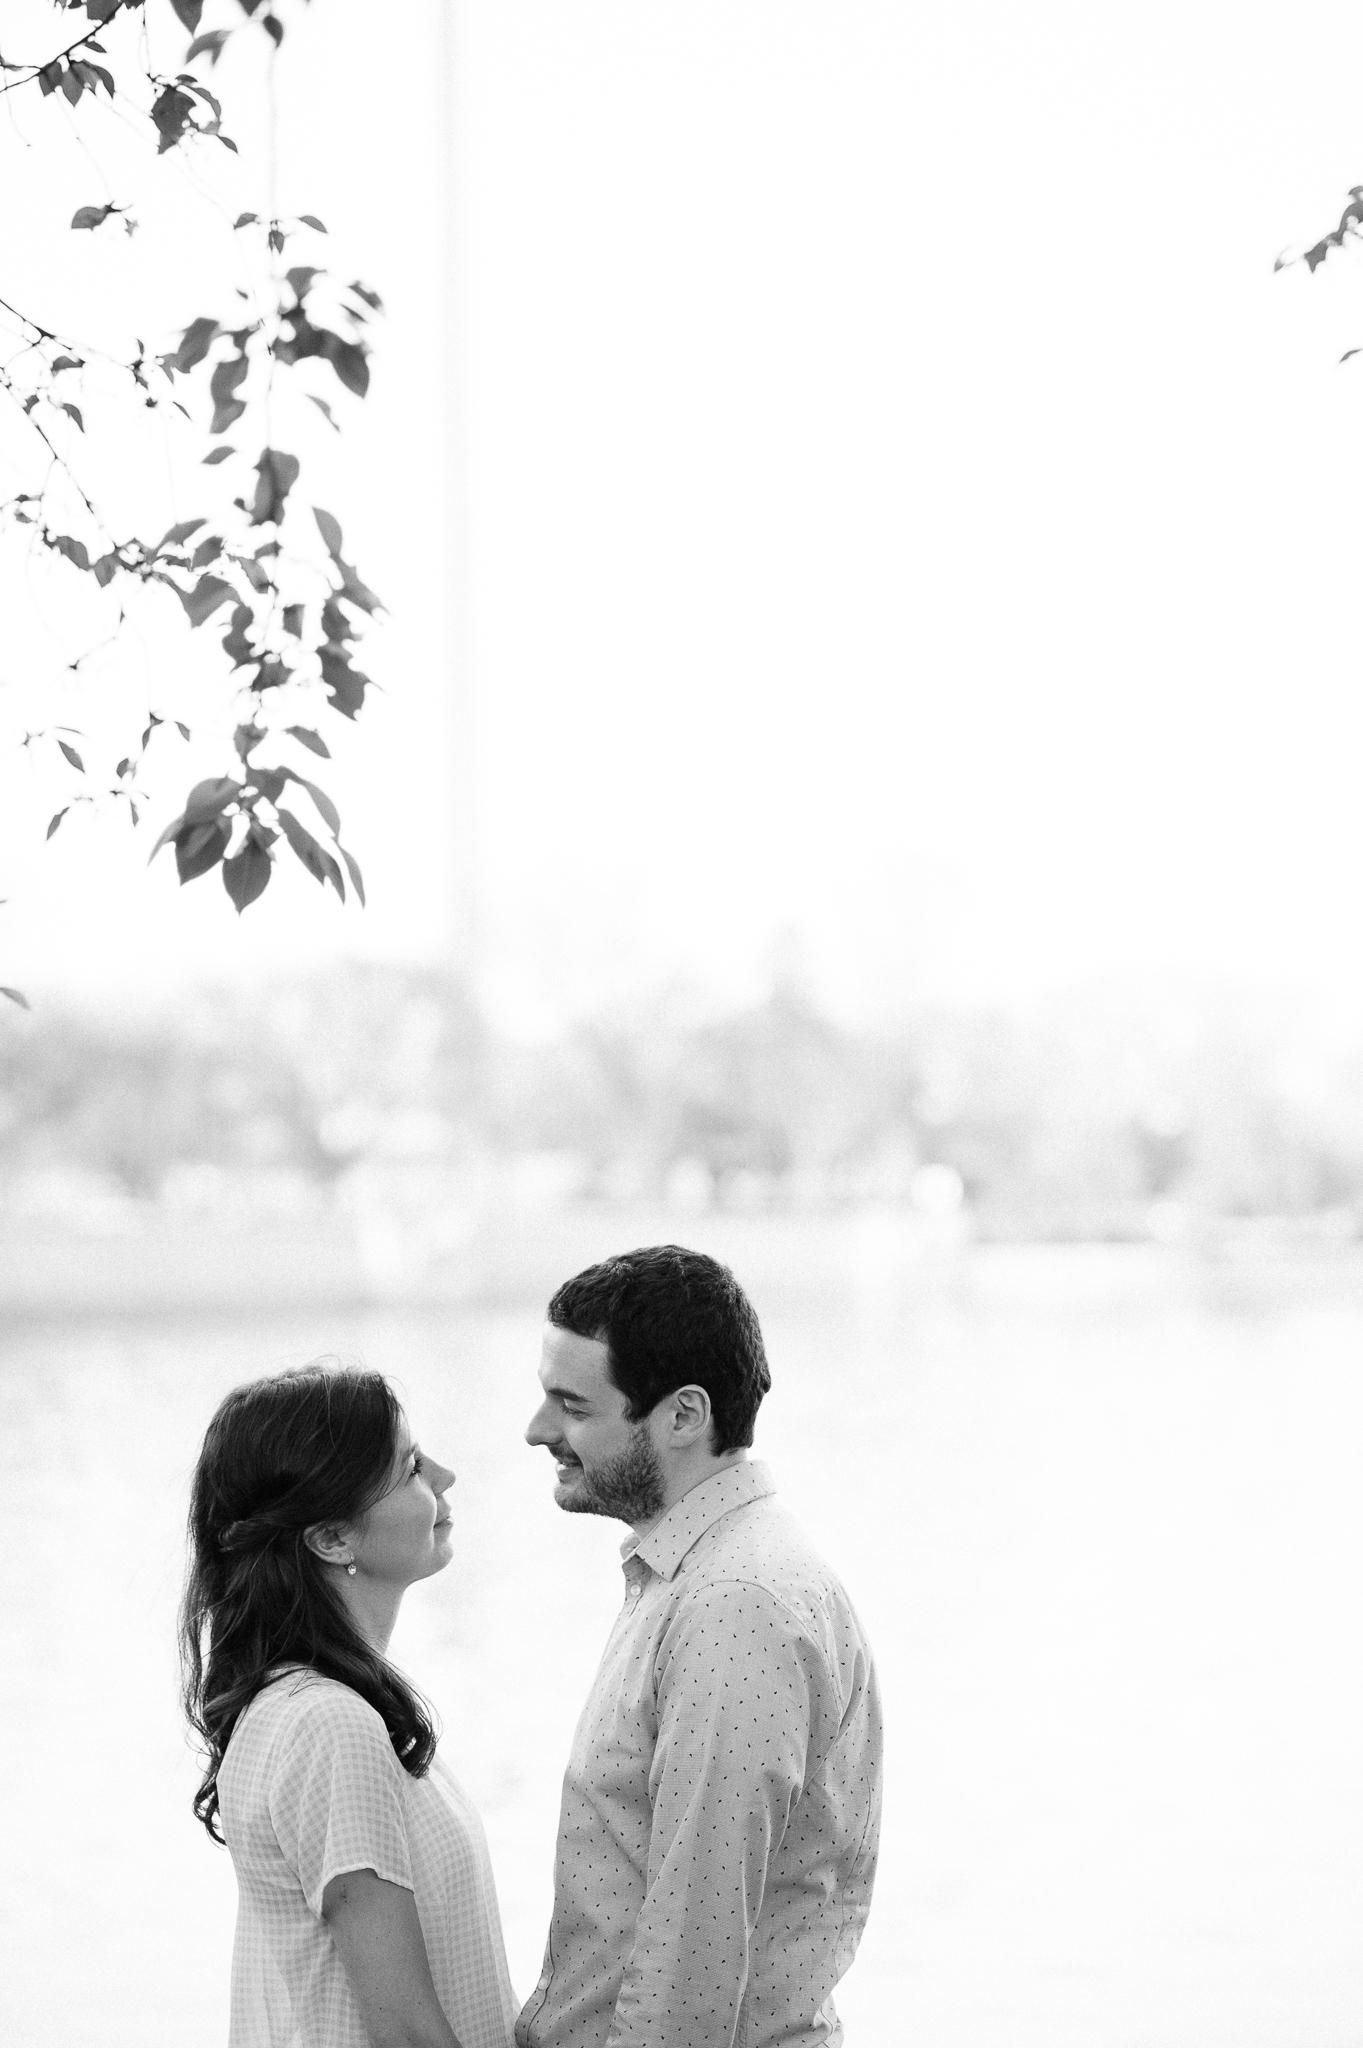 Mark and Christine engagement in Washington DC 04/11/17. Photo Credit: Nicholas Karlin www.karlinvillondo.com